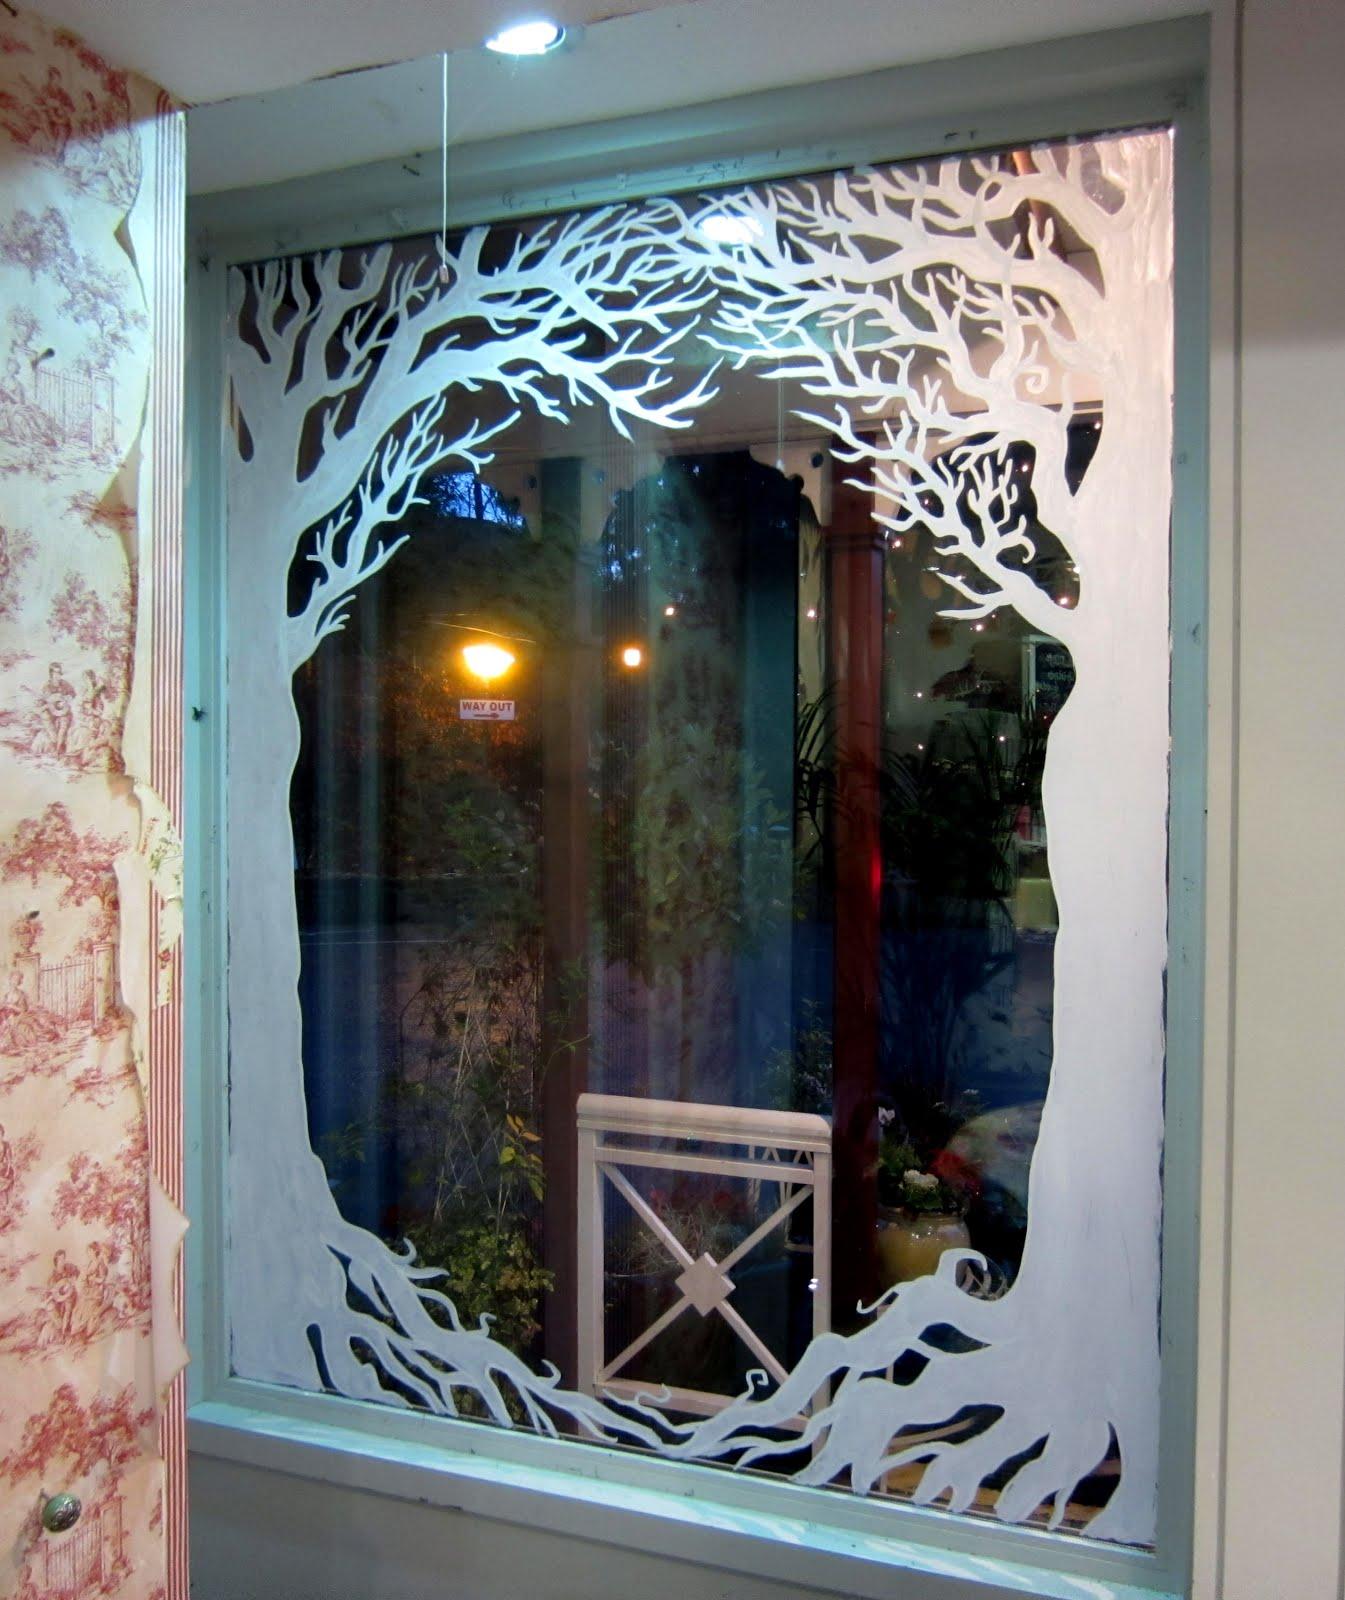 window painting murals dublin avoca kilmacanogue. Black Bedroom Furniture Sets. Home Design Ideas